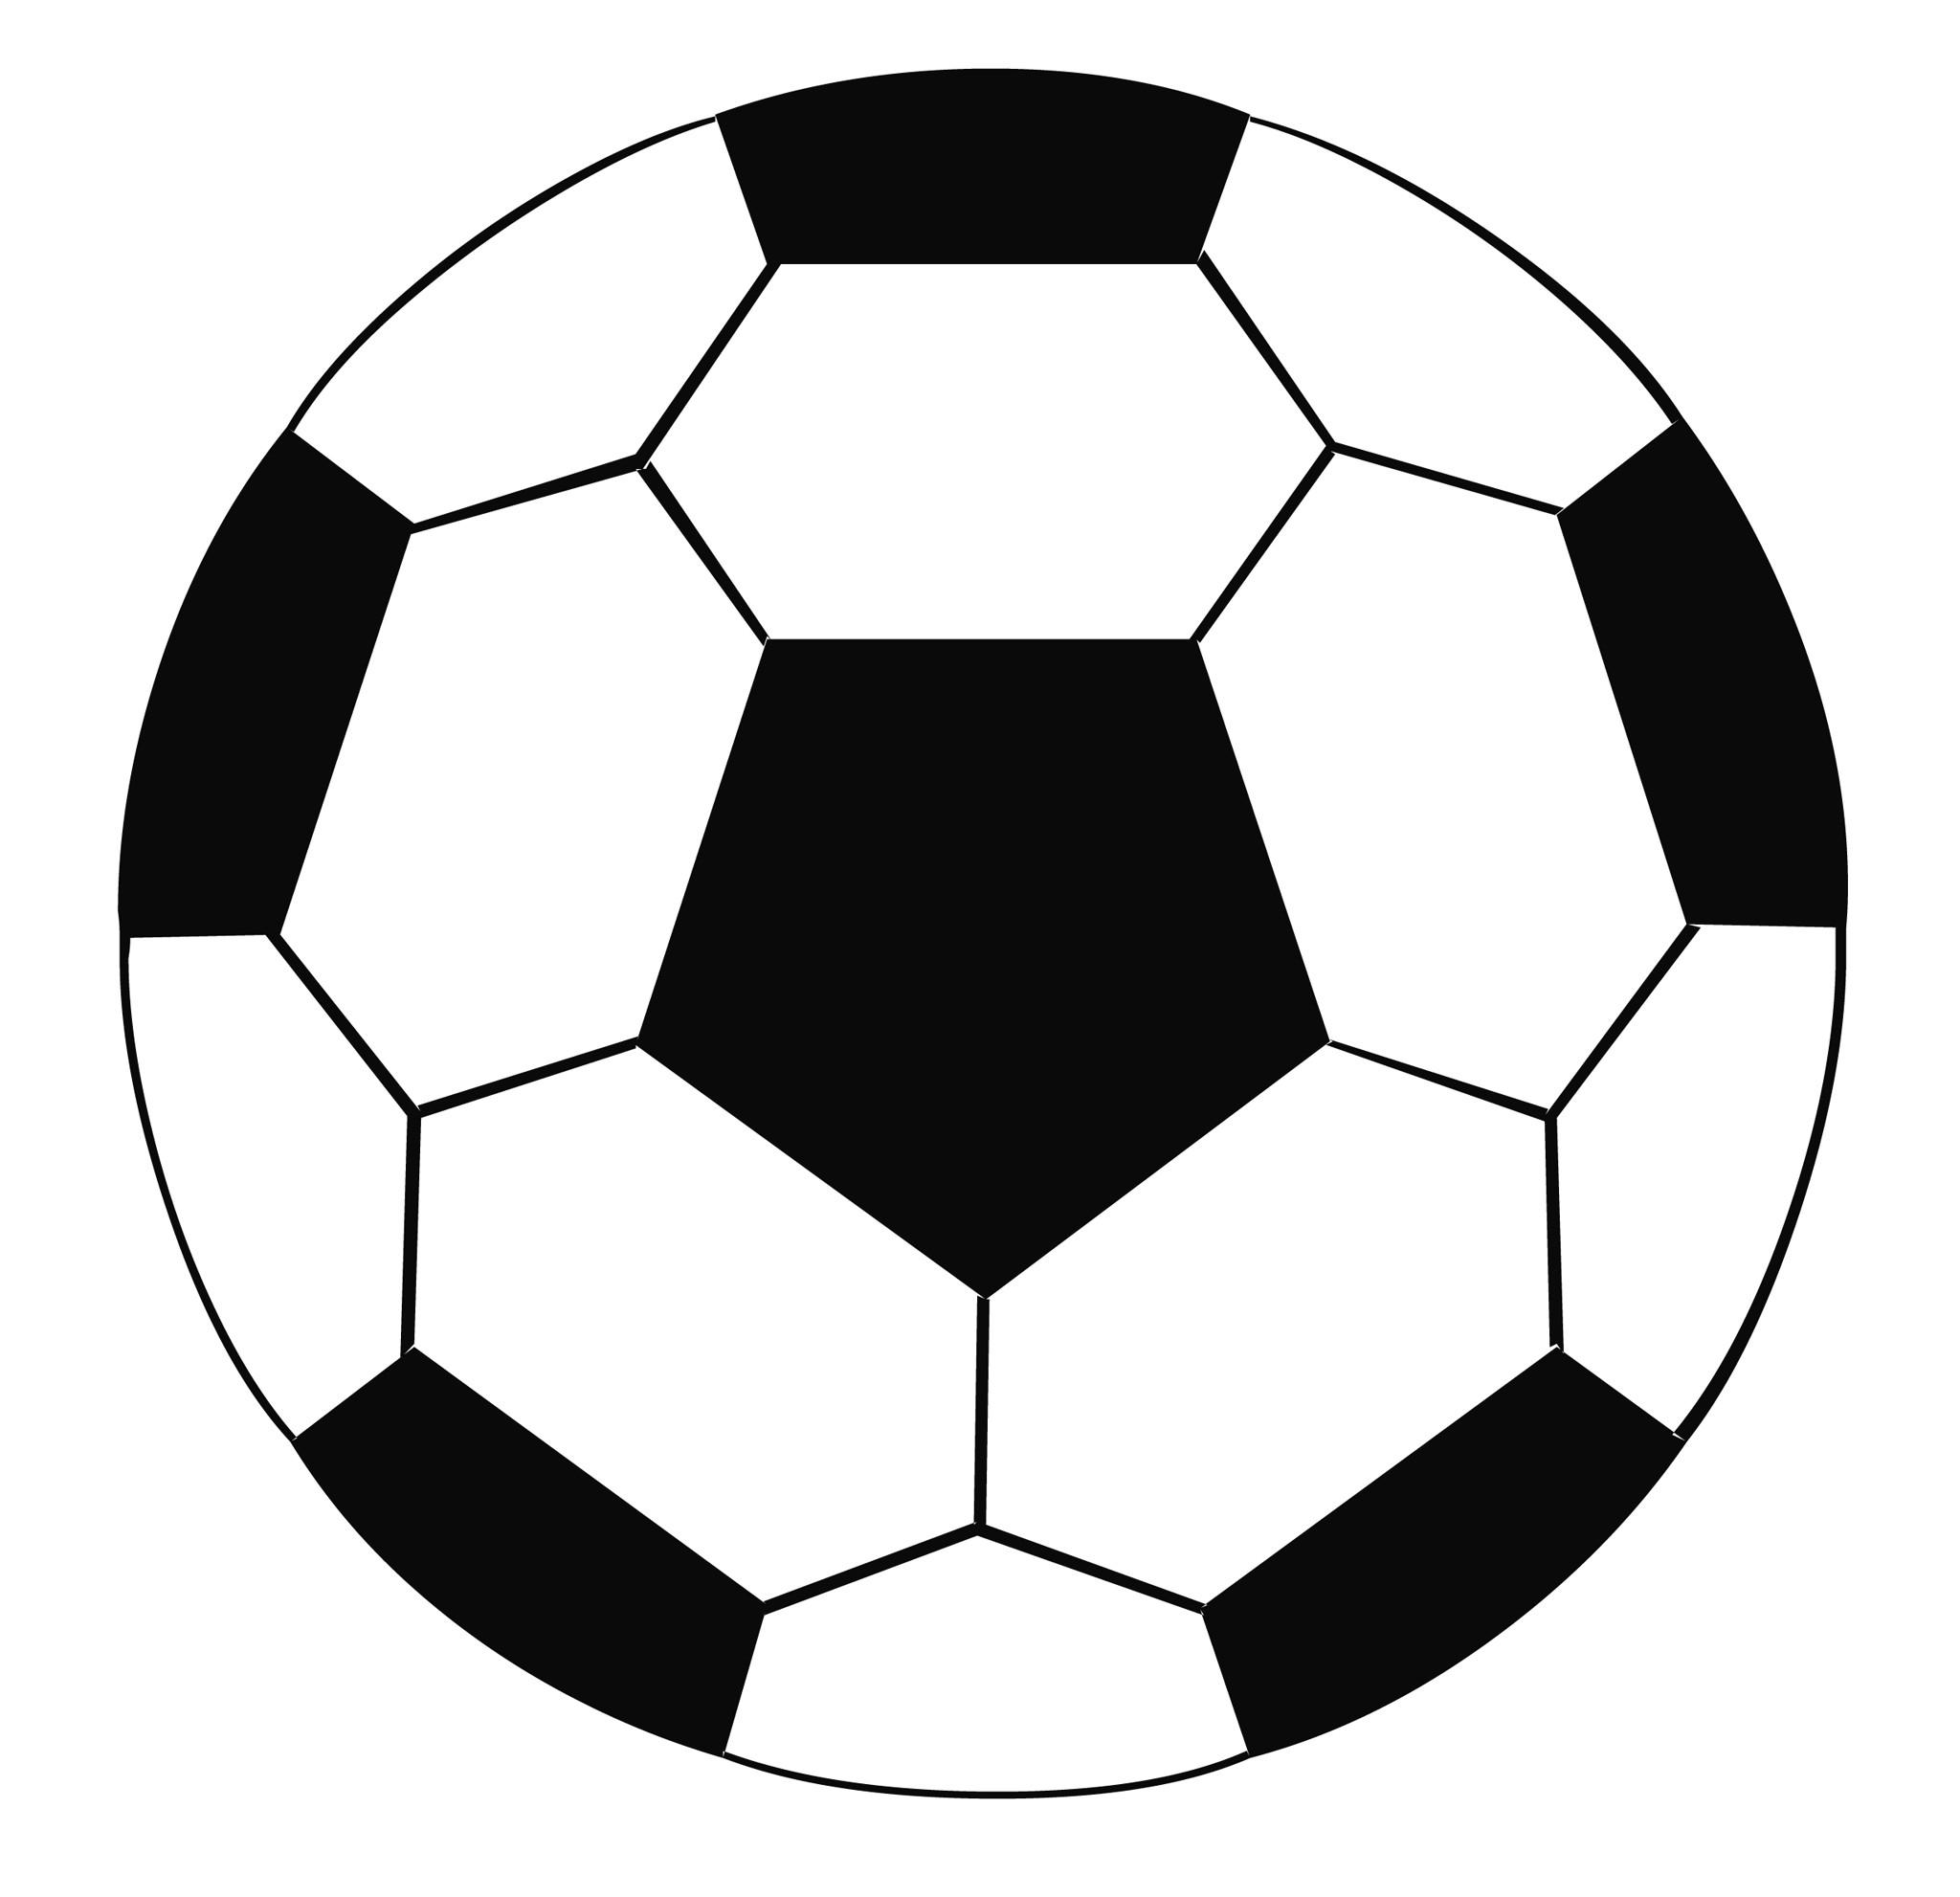 Blue soccer ball clipart clip art royalty free library Soccer Balls Clipart & Soccer Balls Clip Art Images - ClipartALL.com clip art royalty free library